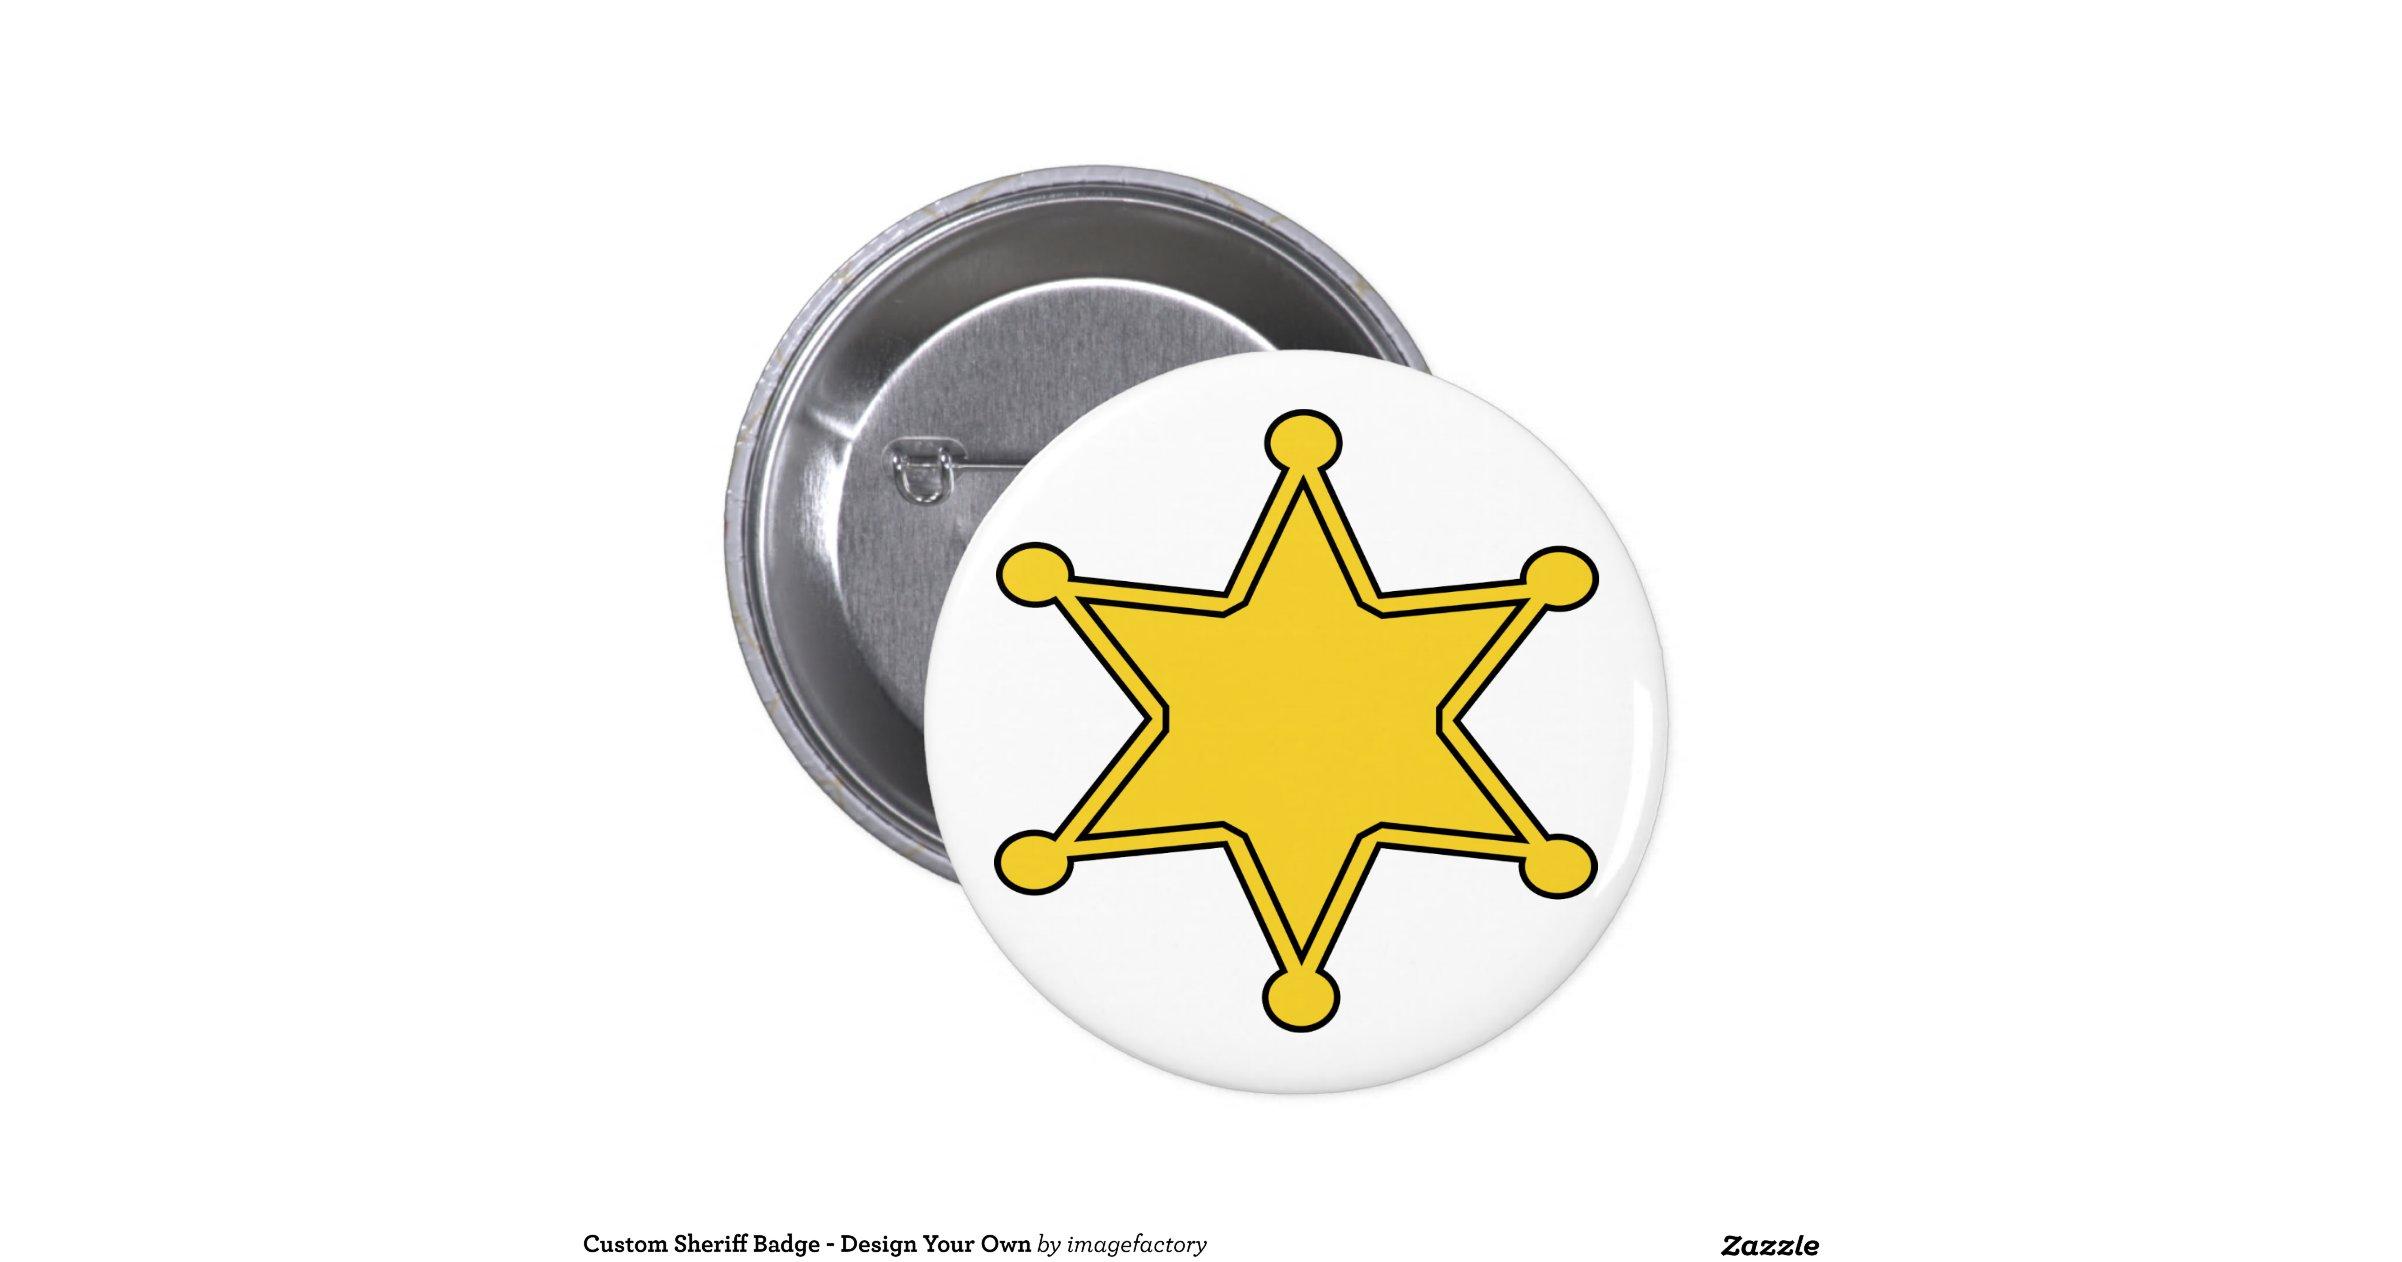 Custom sheriff badge design your own zazzle for Zazzle custom t shirts